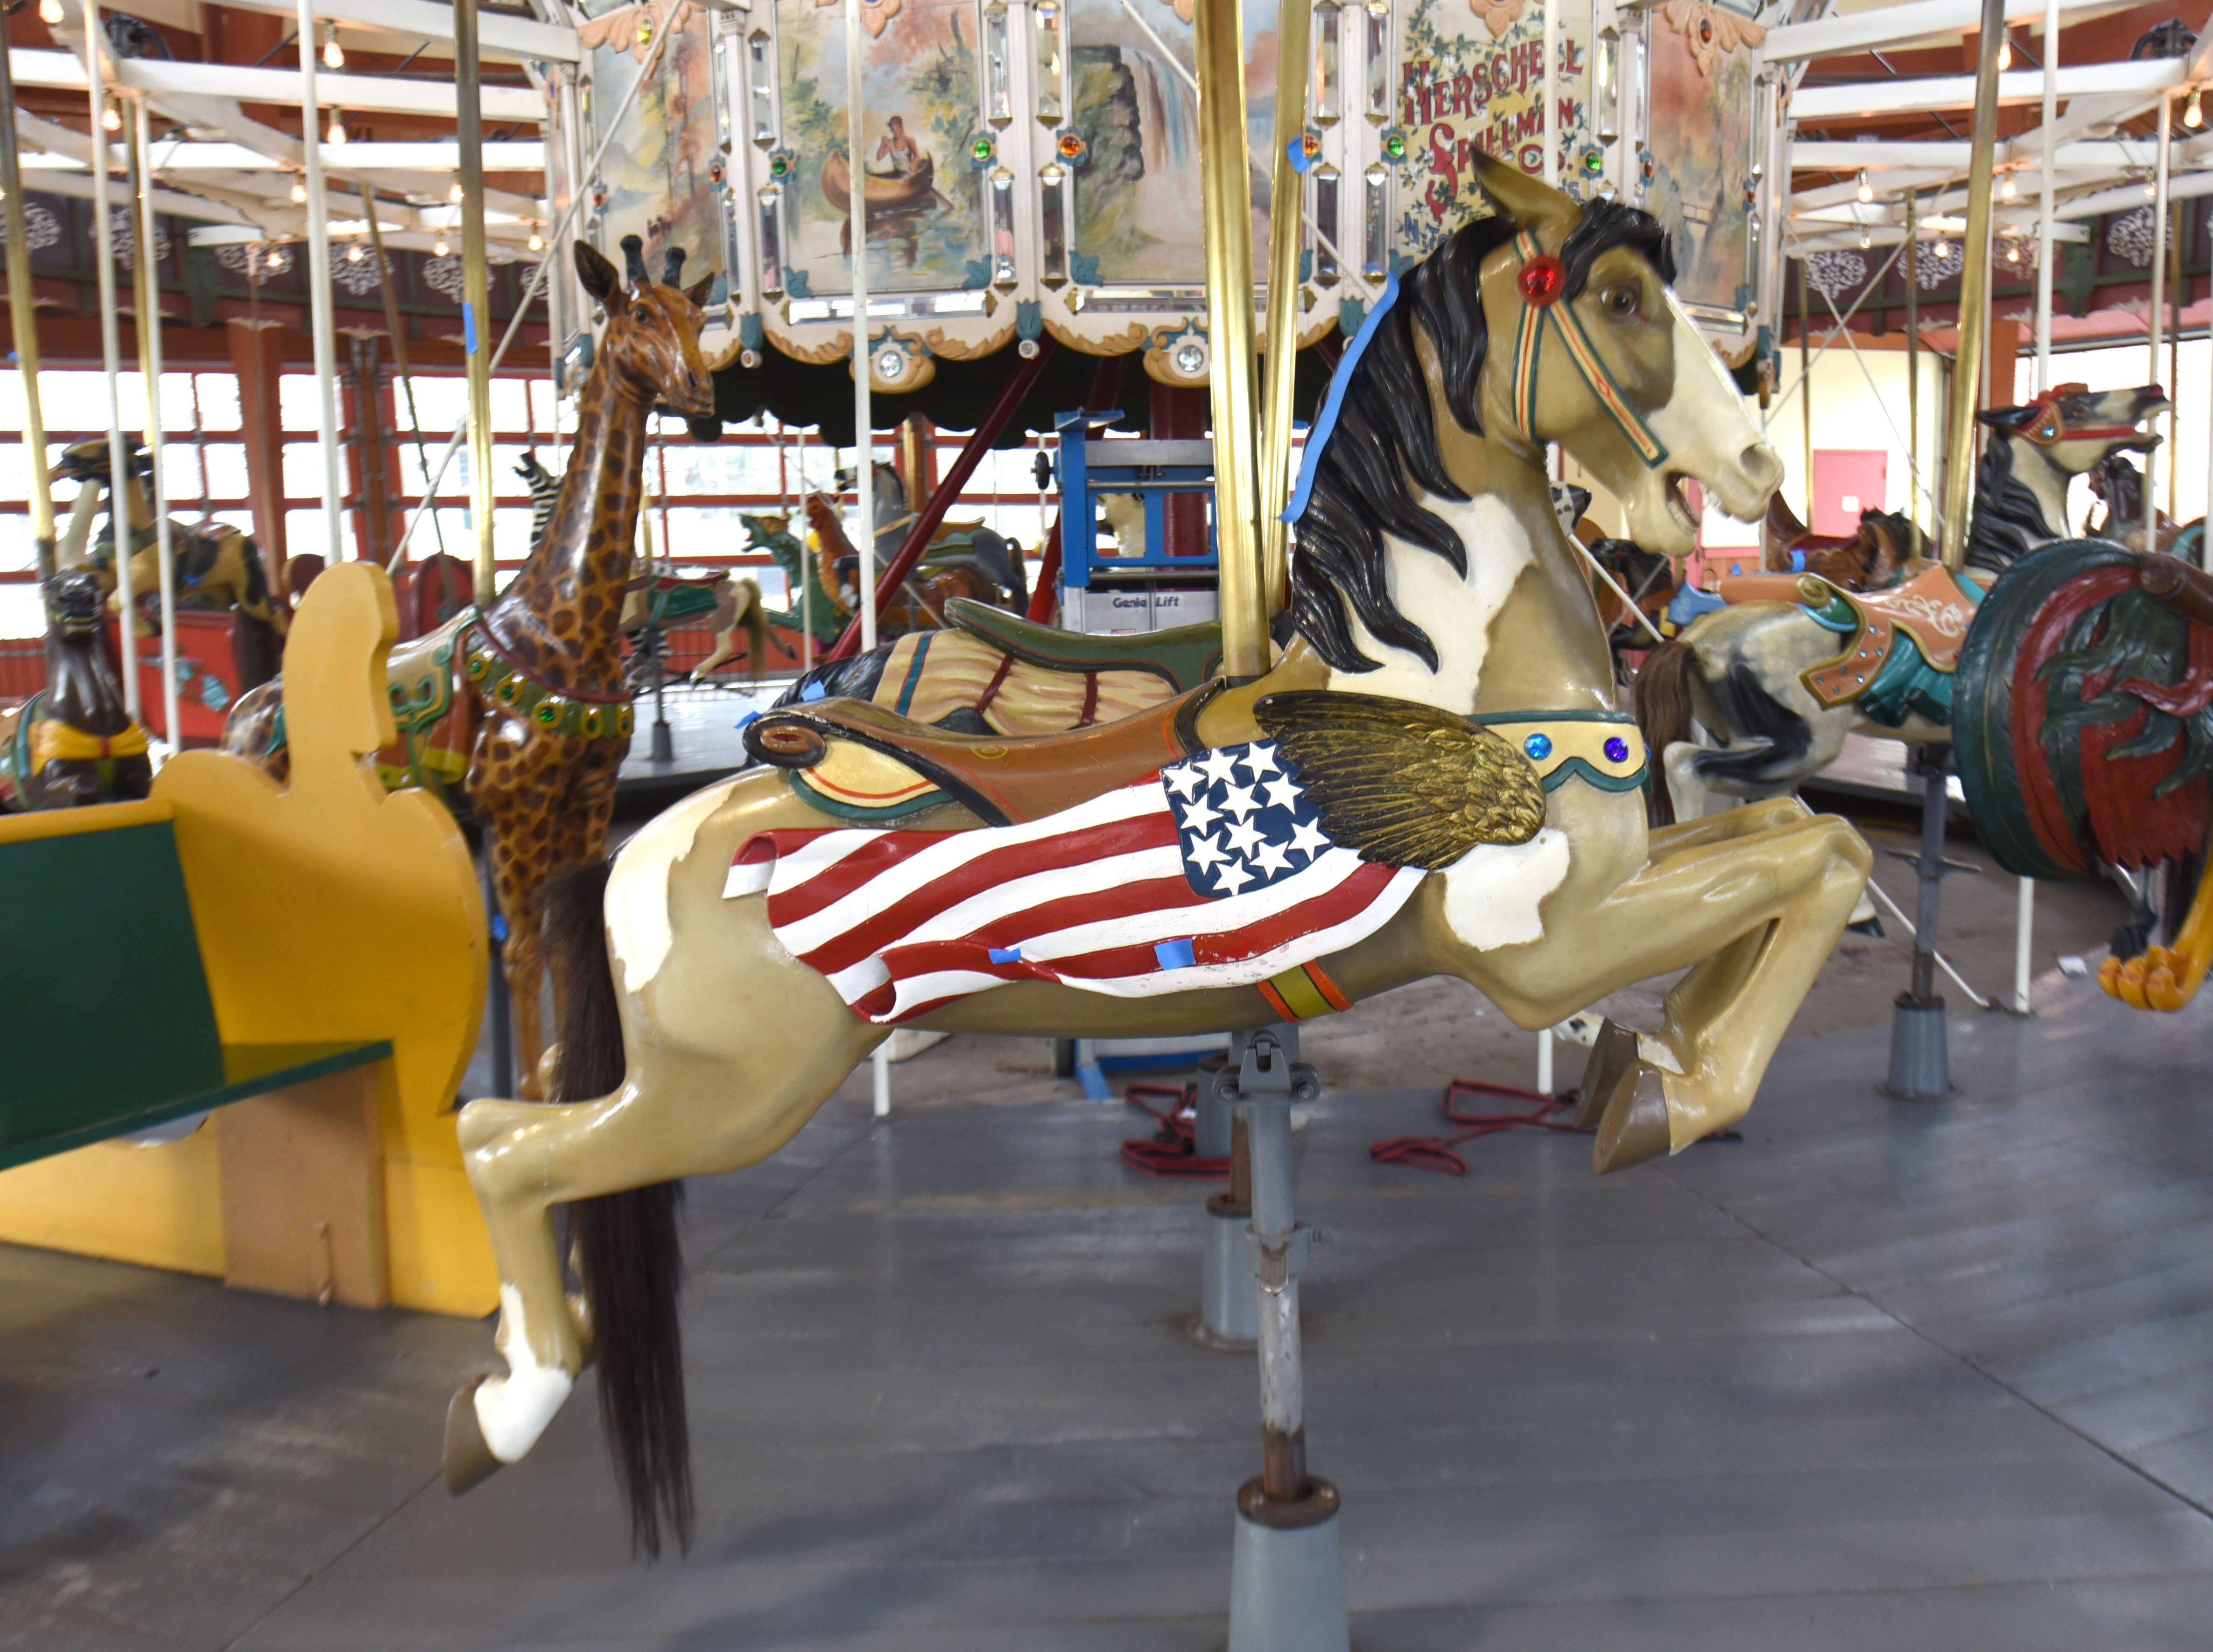 Julie Fournier, historic restoration artist,  works on the restoration carousel figures at Greenfield Village.